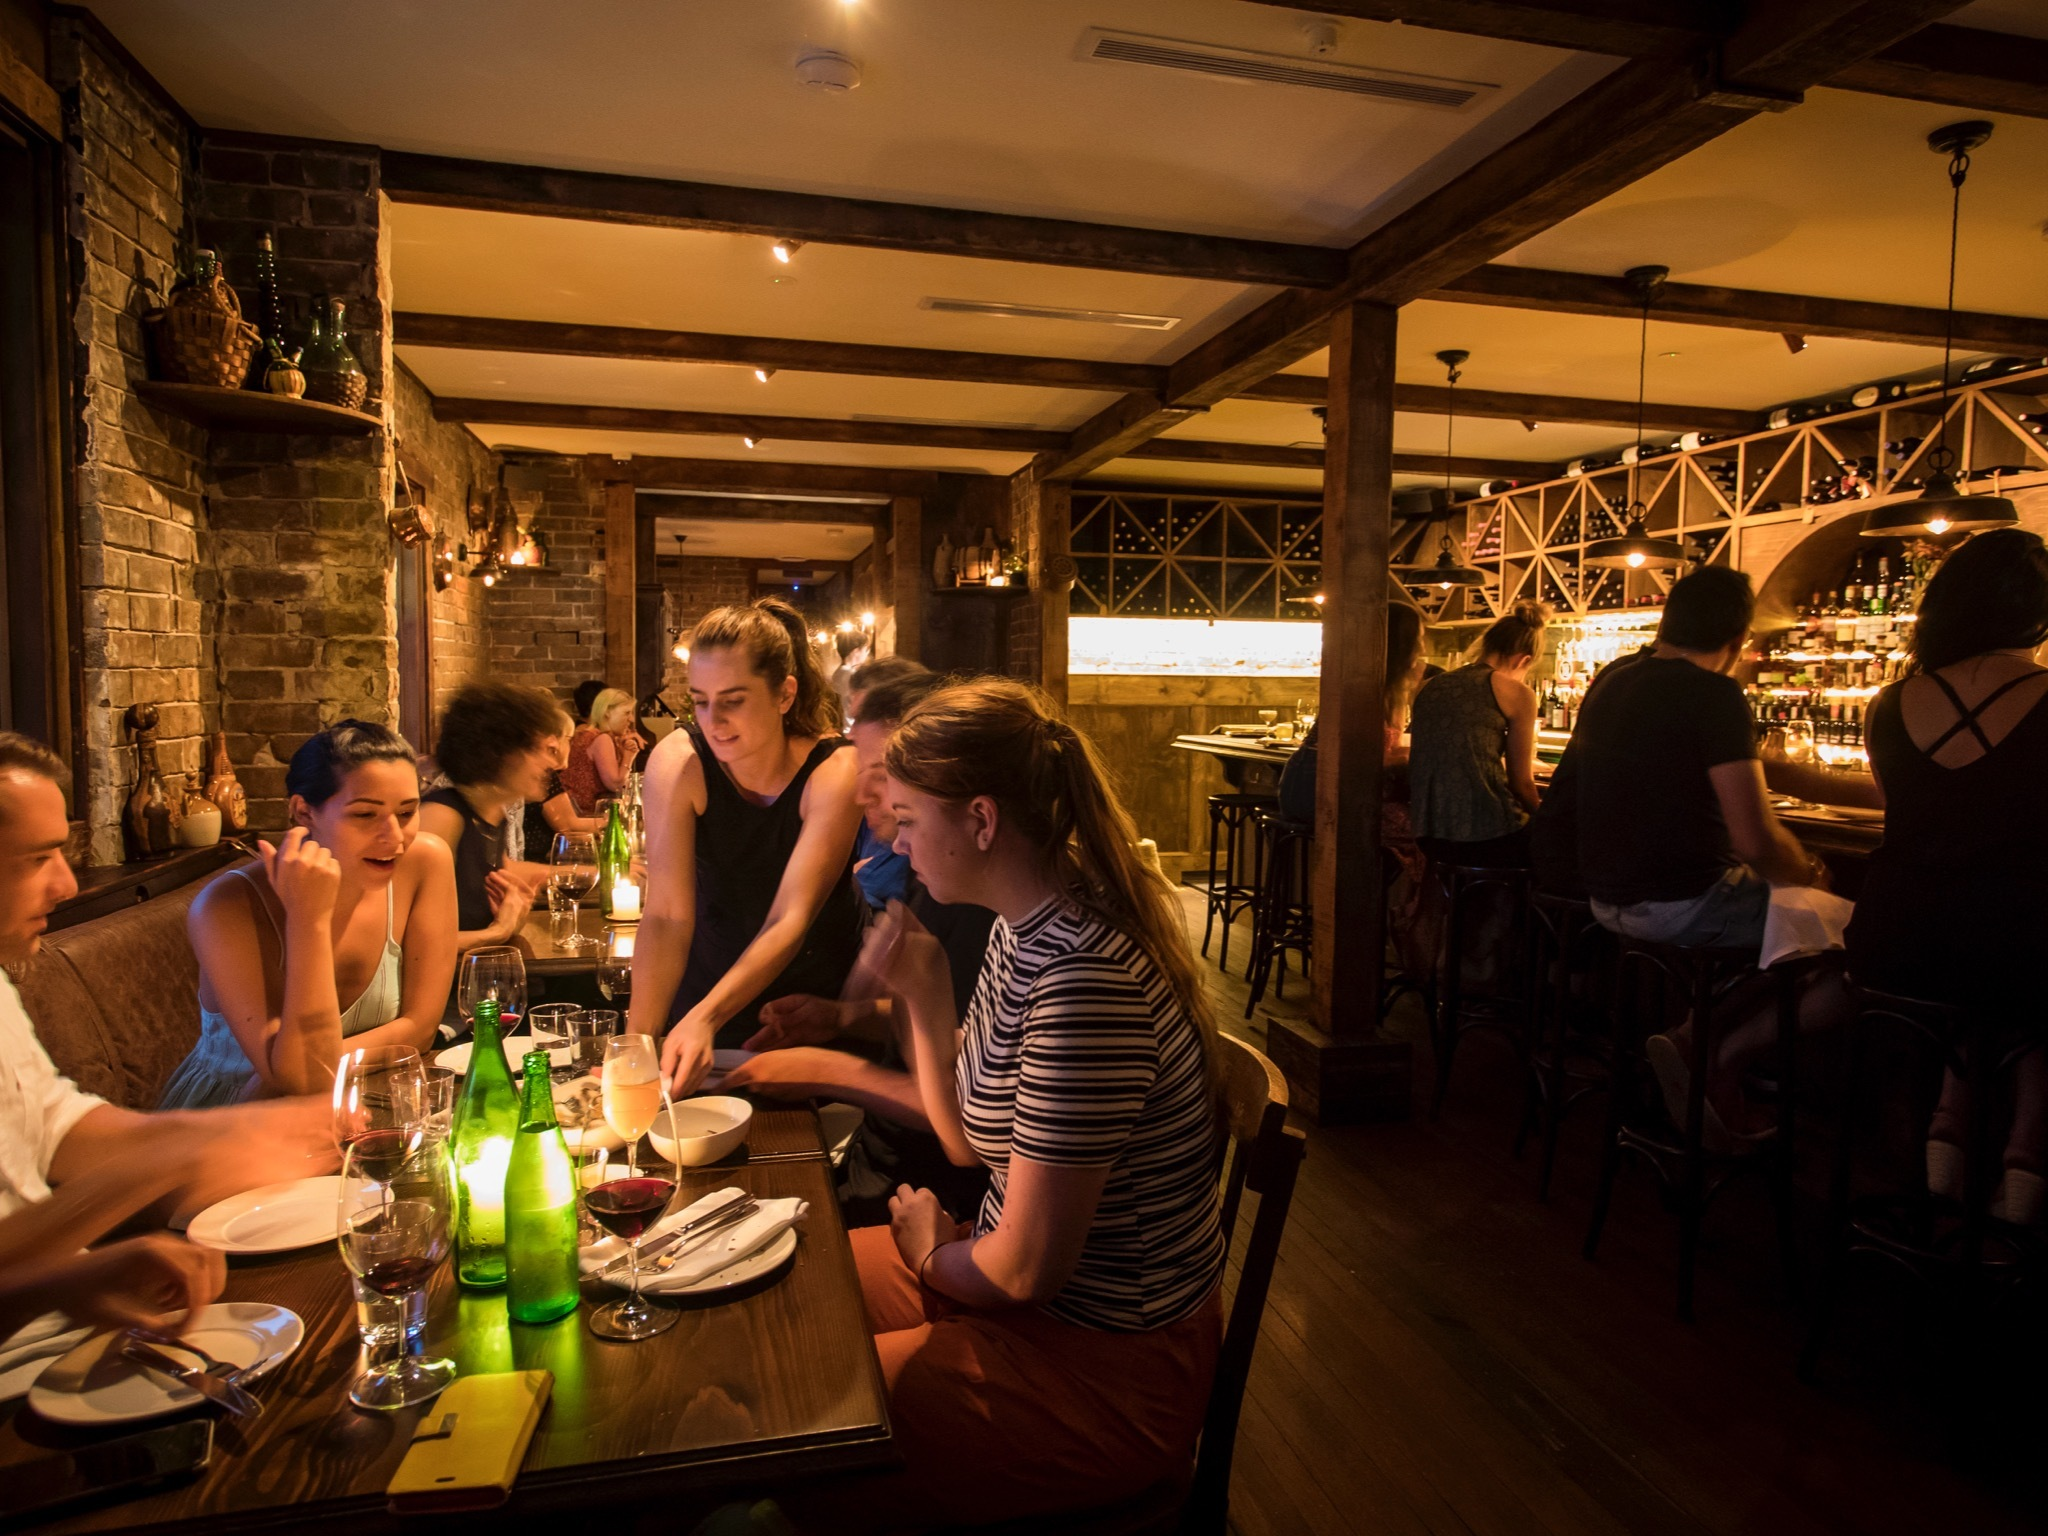 Dining area at Pino Vino e Cucina